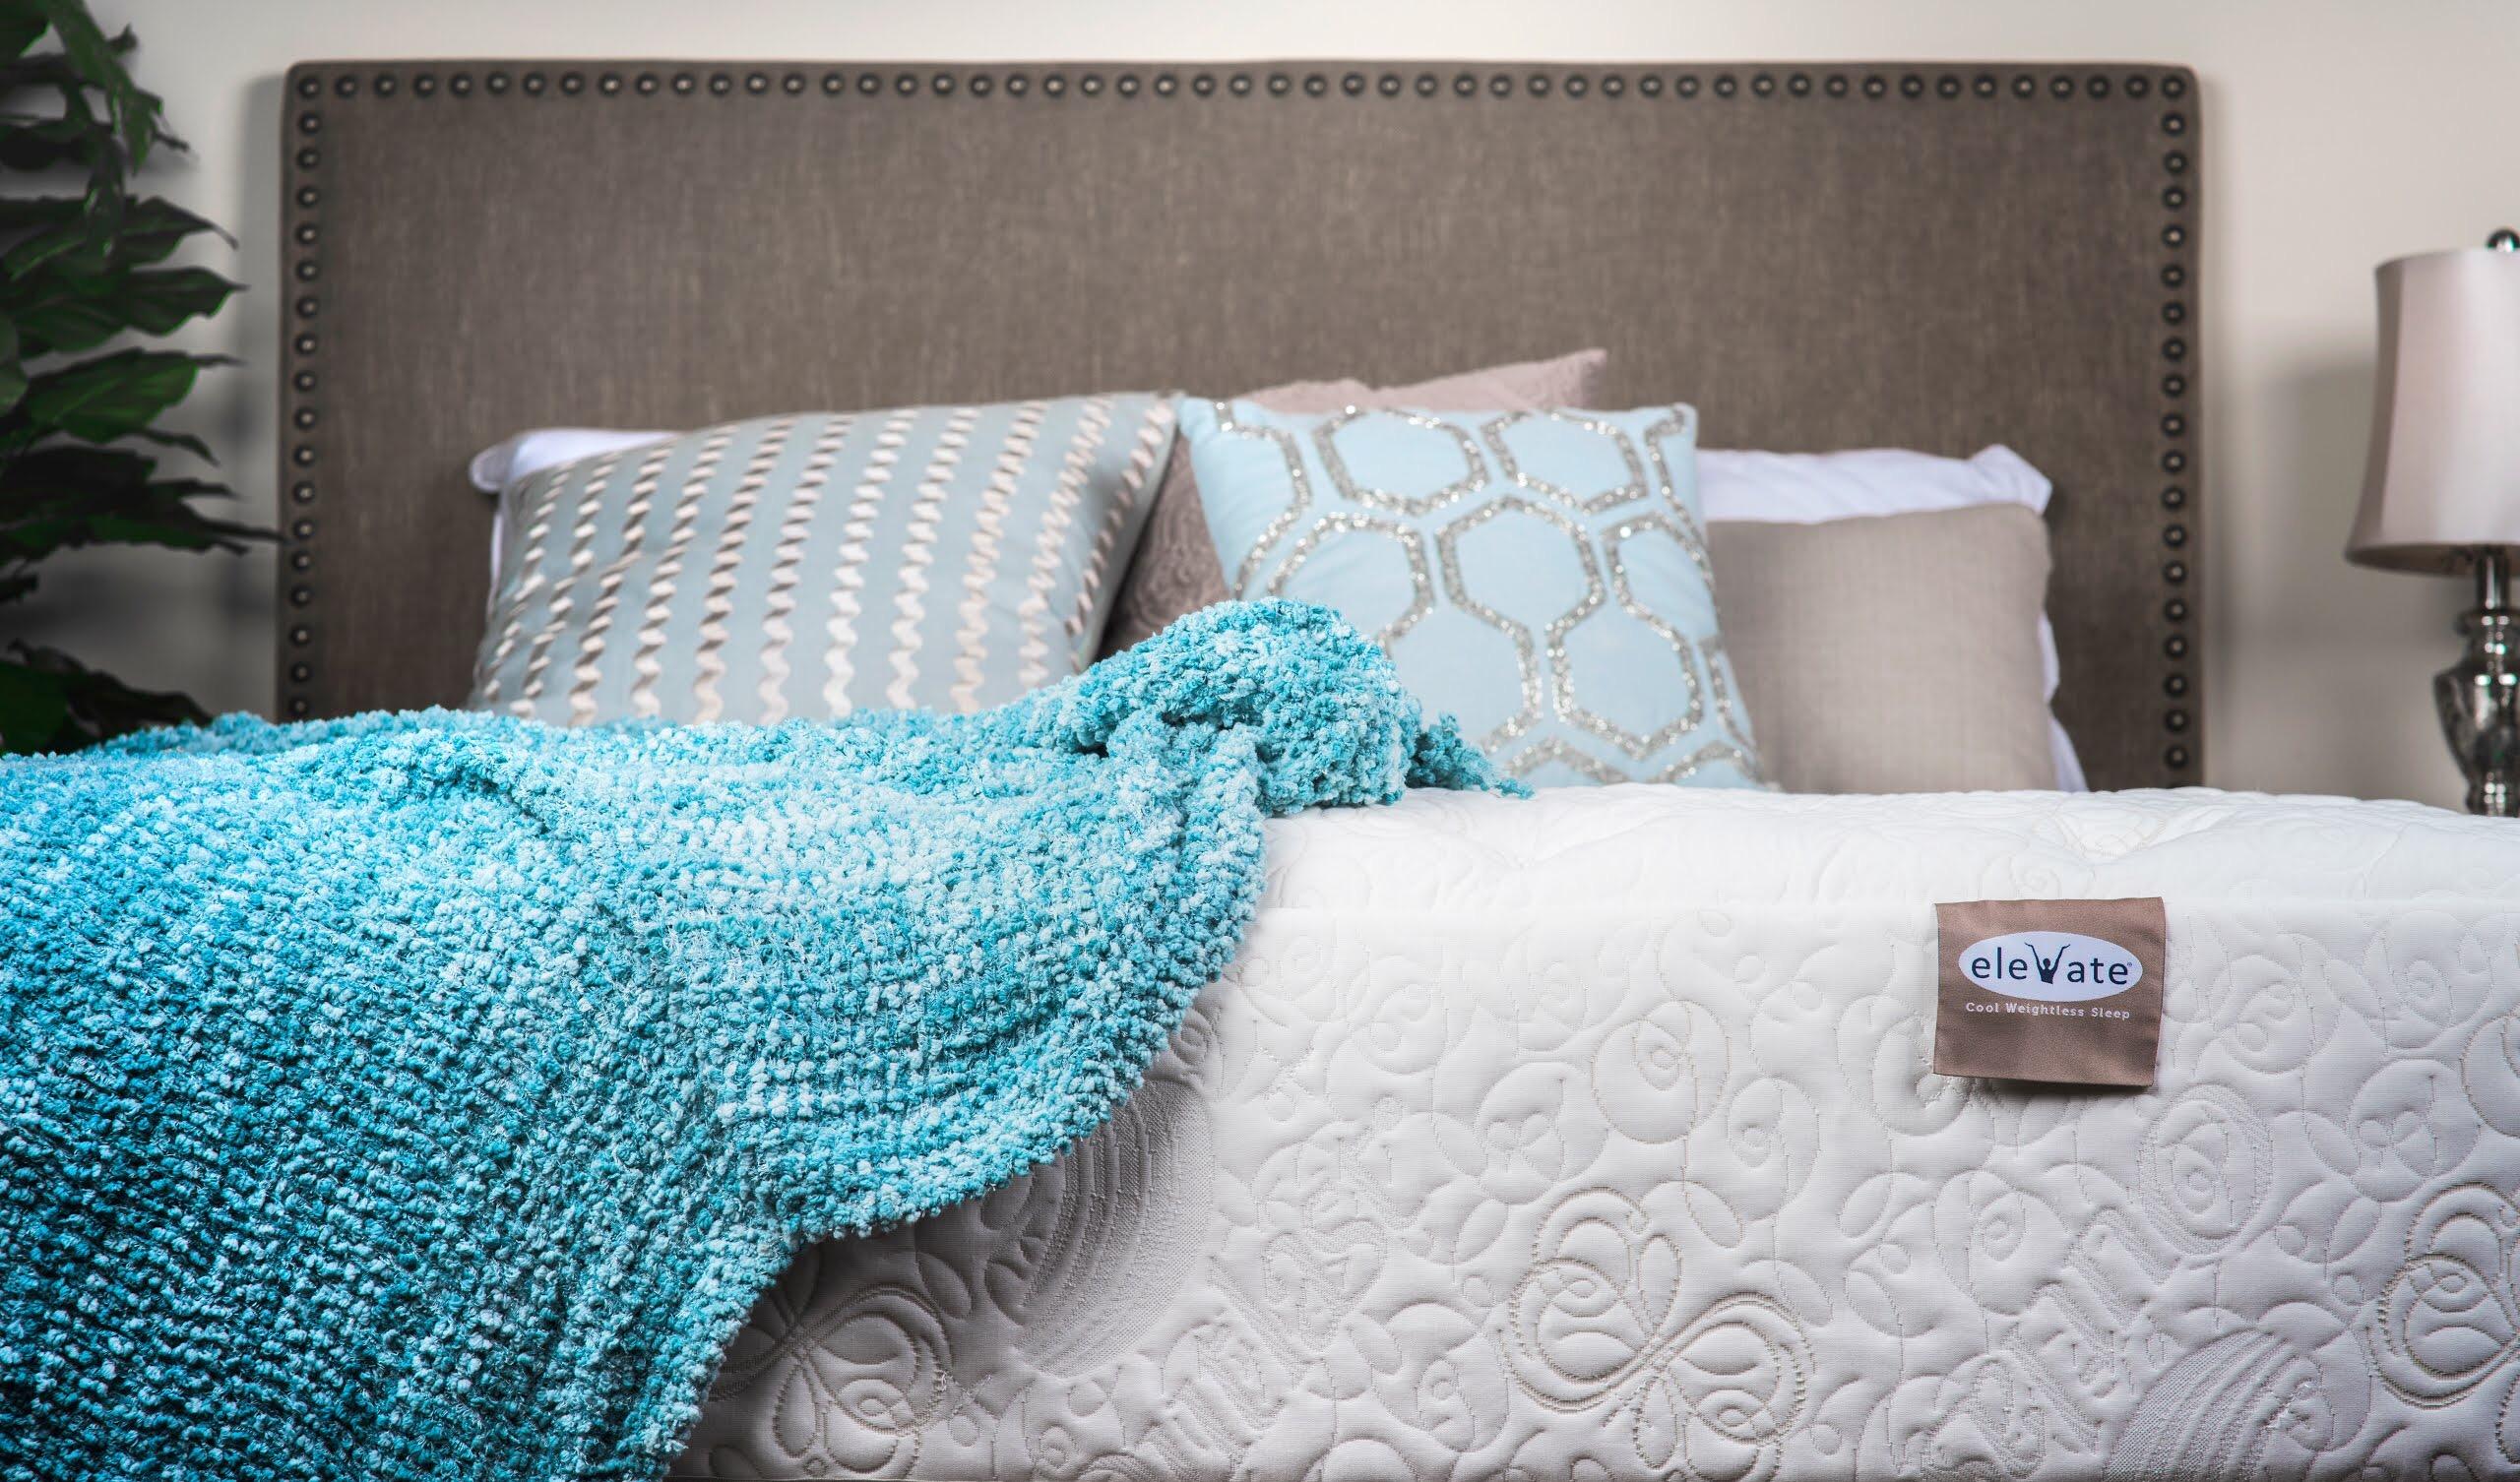 Elevate Mattress Solace Luxury Firm Mattress Reviews